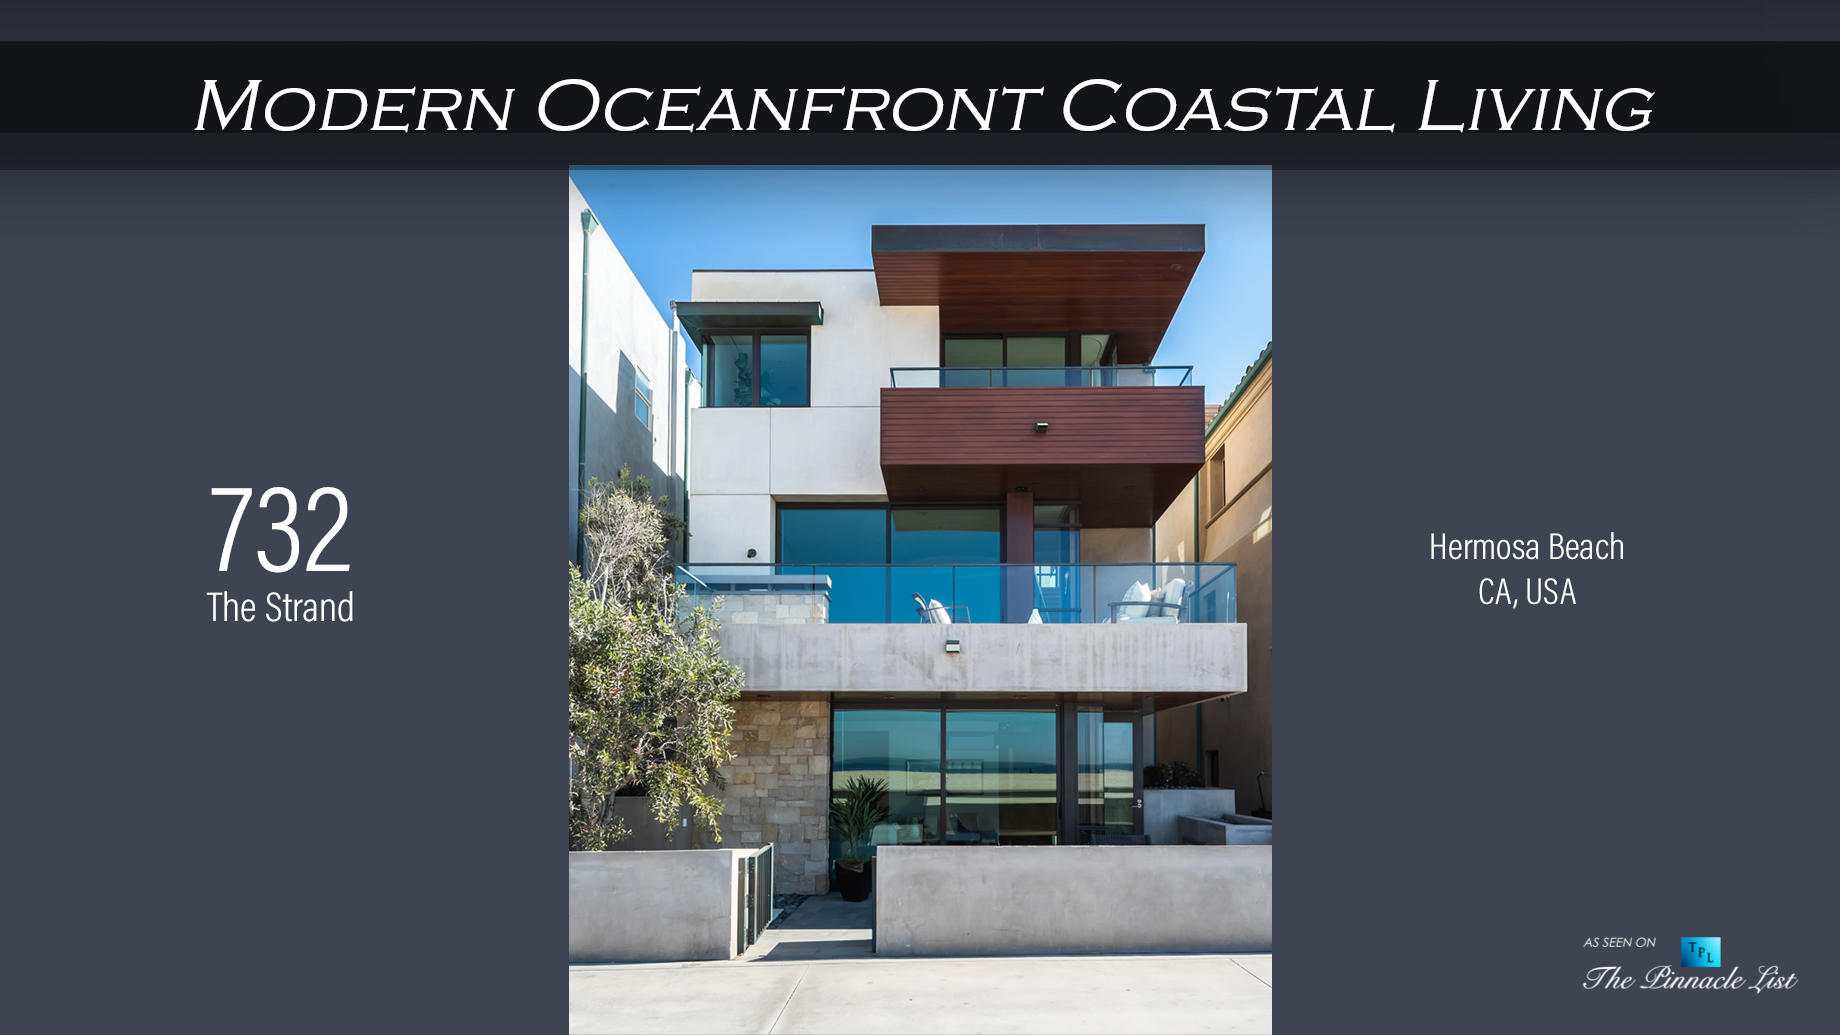 Modern Oceanfront Coastal Living - 732 The Strand, Hermosa Beach, CA, USA